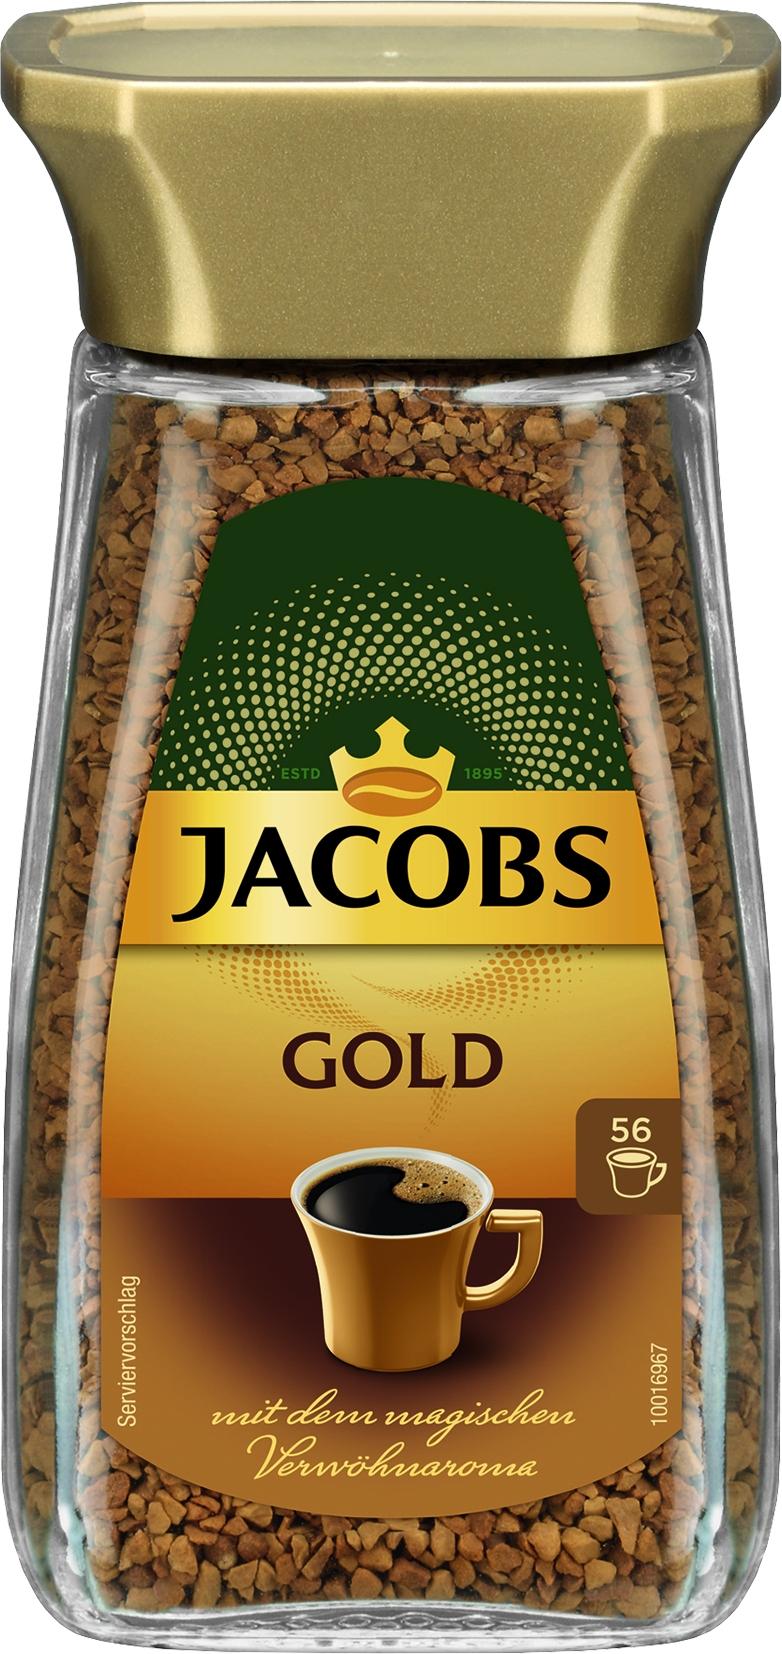 Cronat Gold, Instant Kaffee